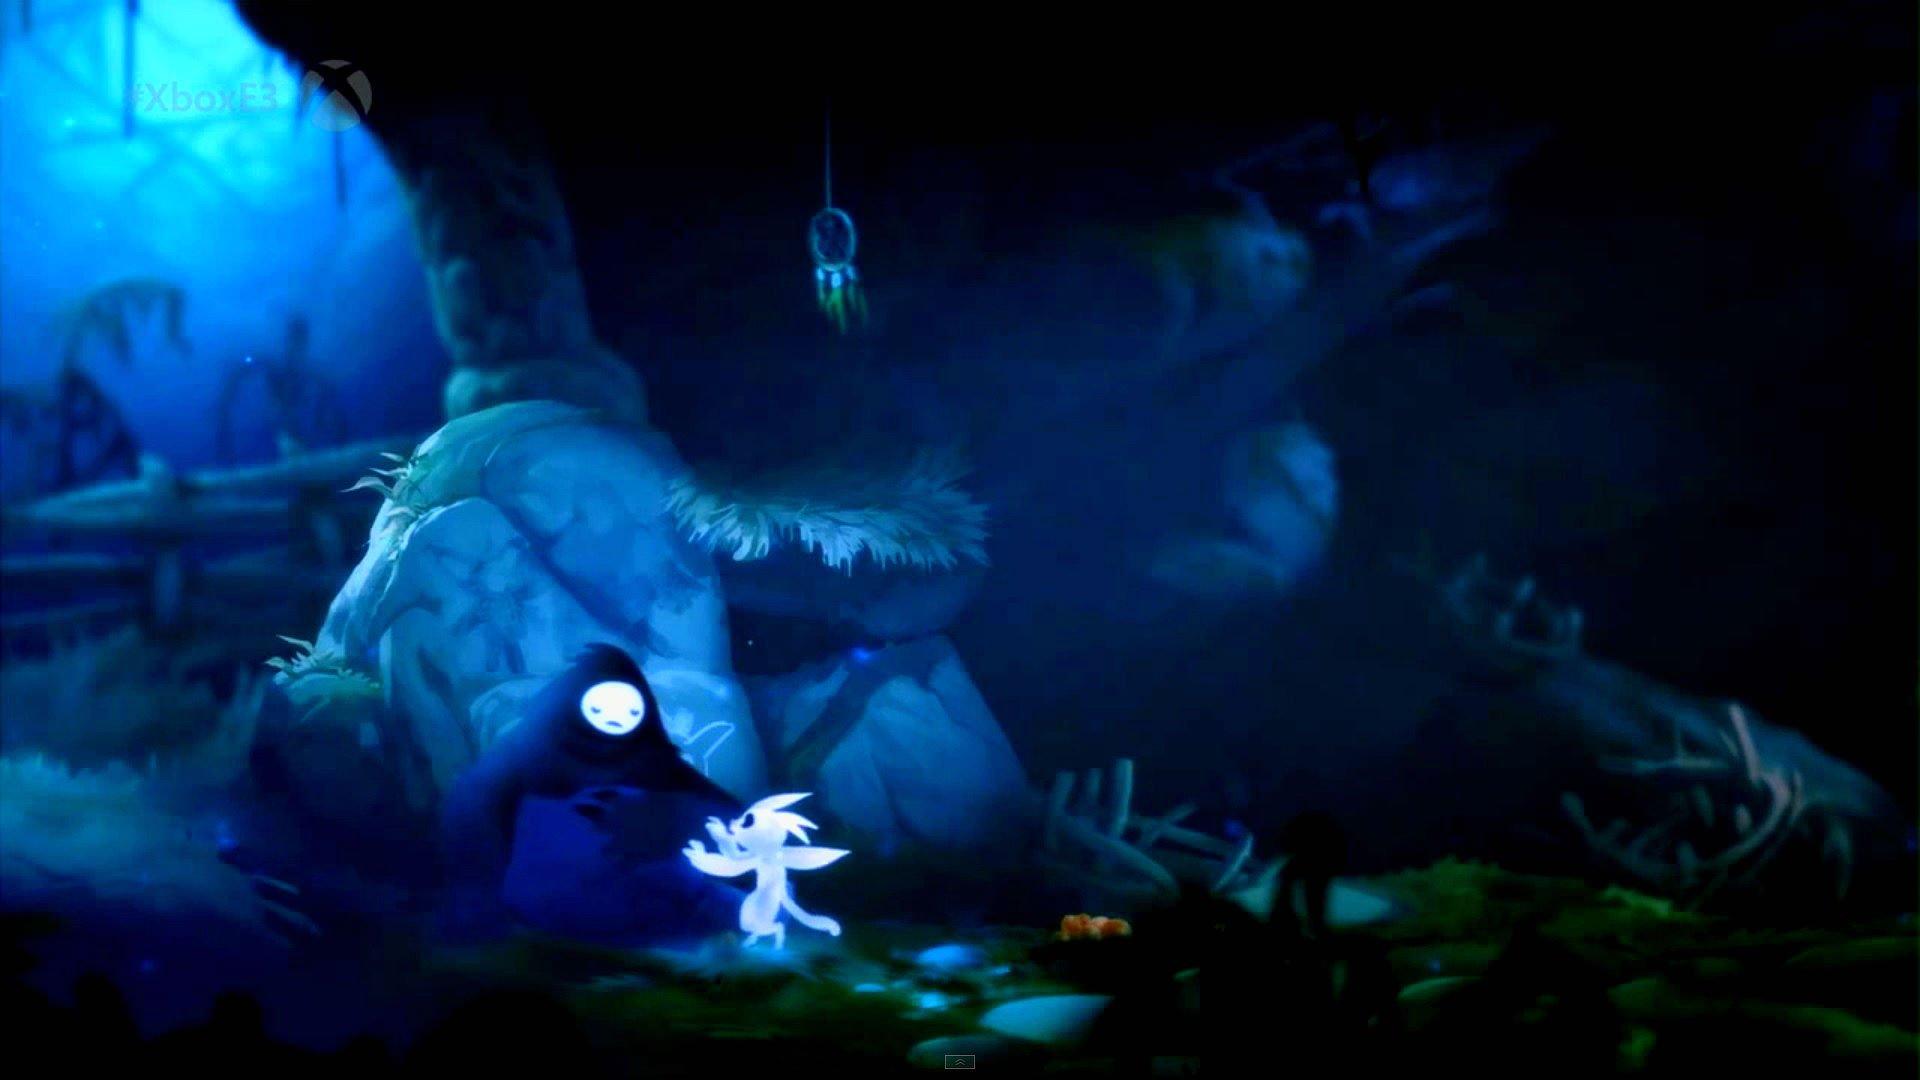 ORI BLIND FOREST action adventure rpg fantasy ori blind 1920x1080